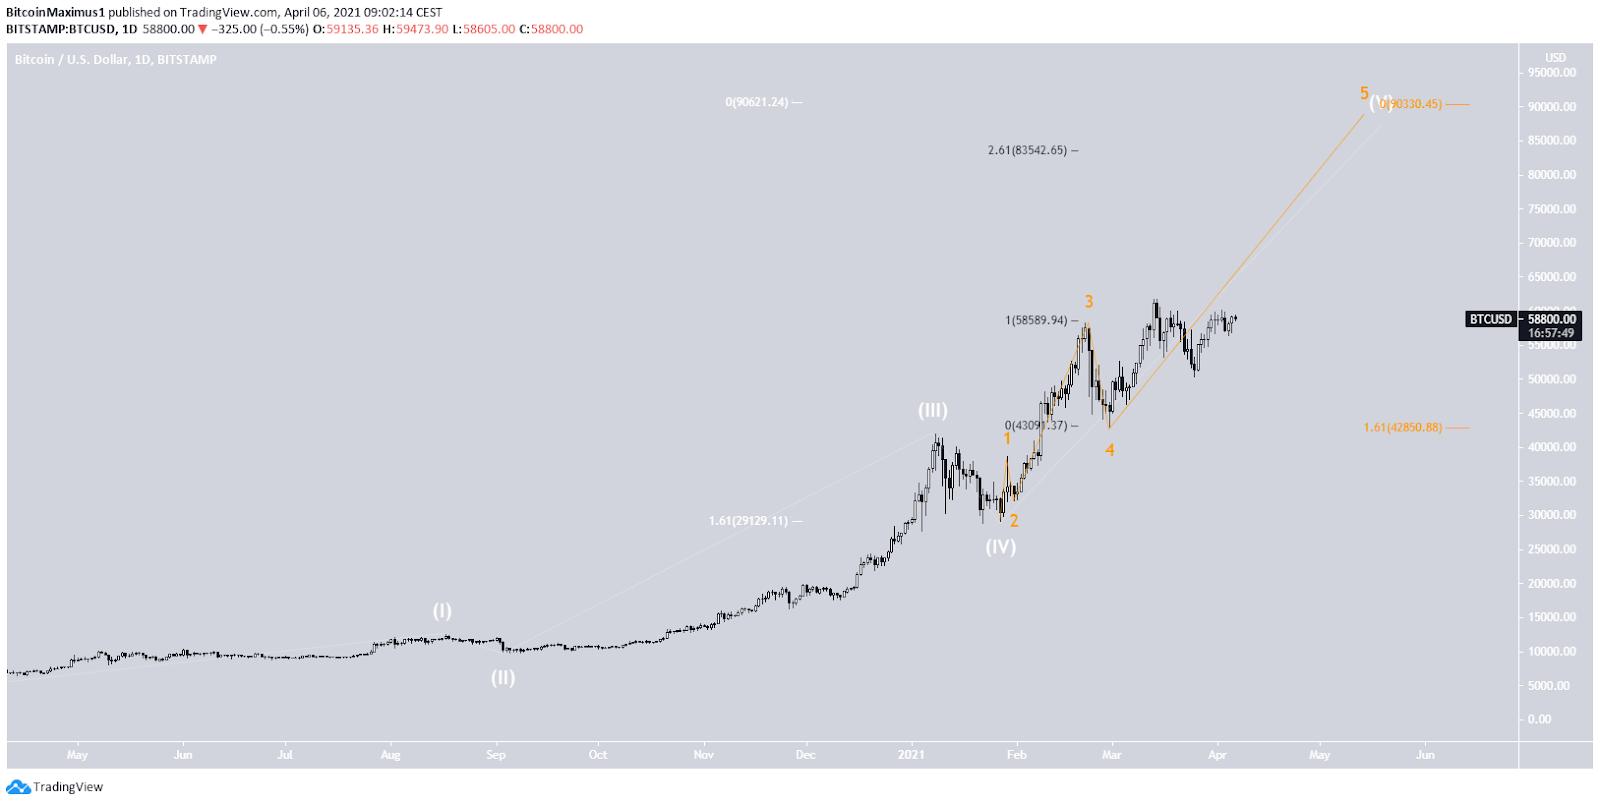 Bitcoin Preis Wellenanalyse 06.04.2021